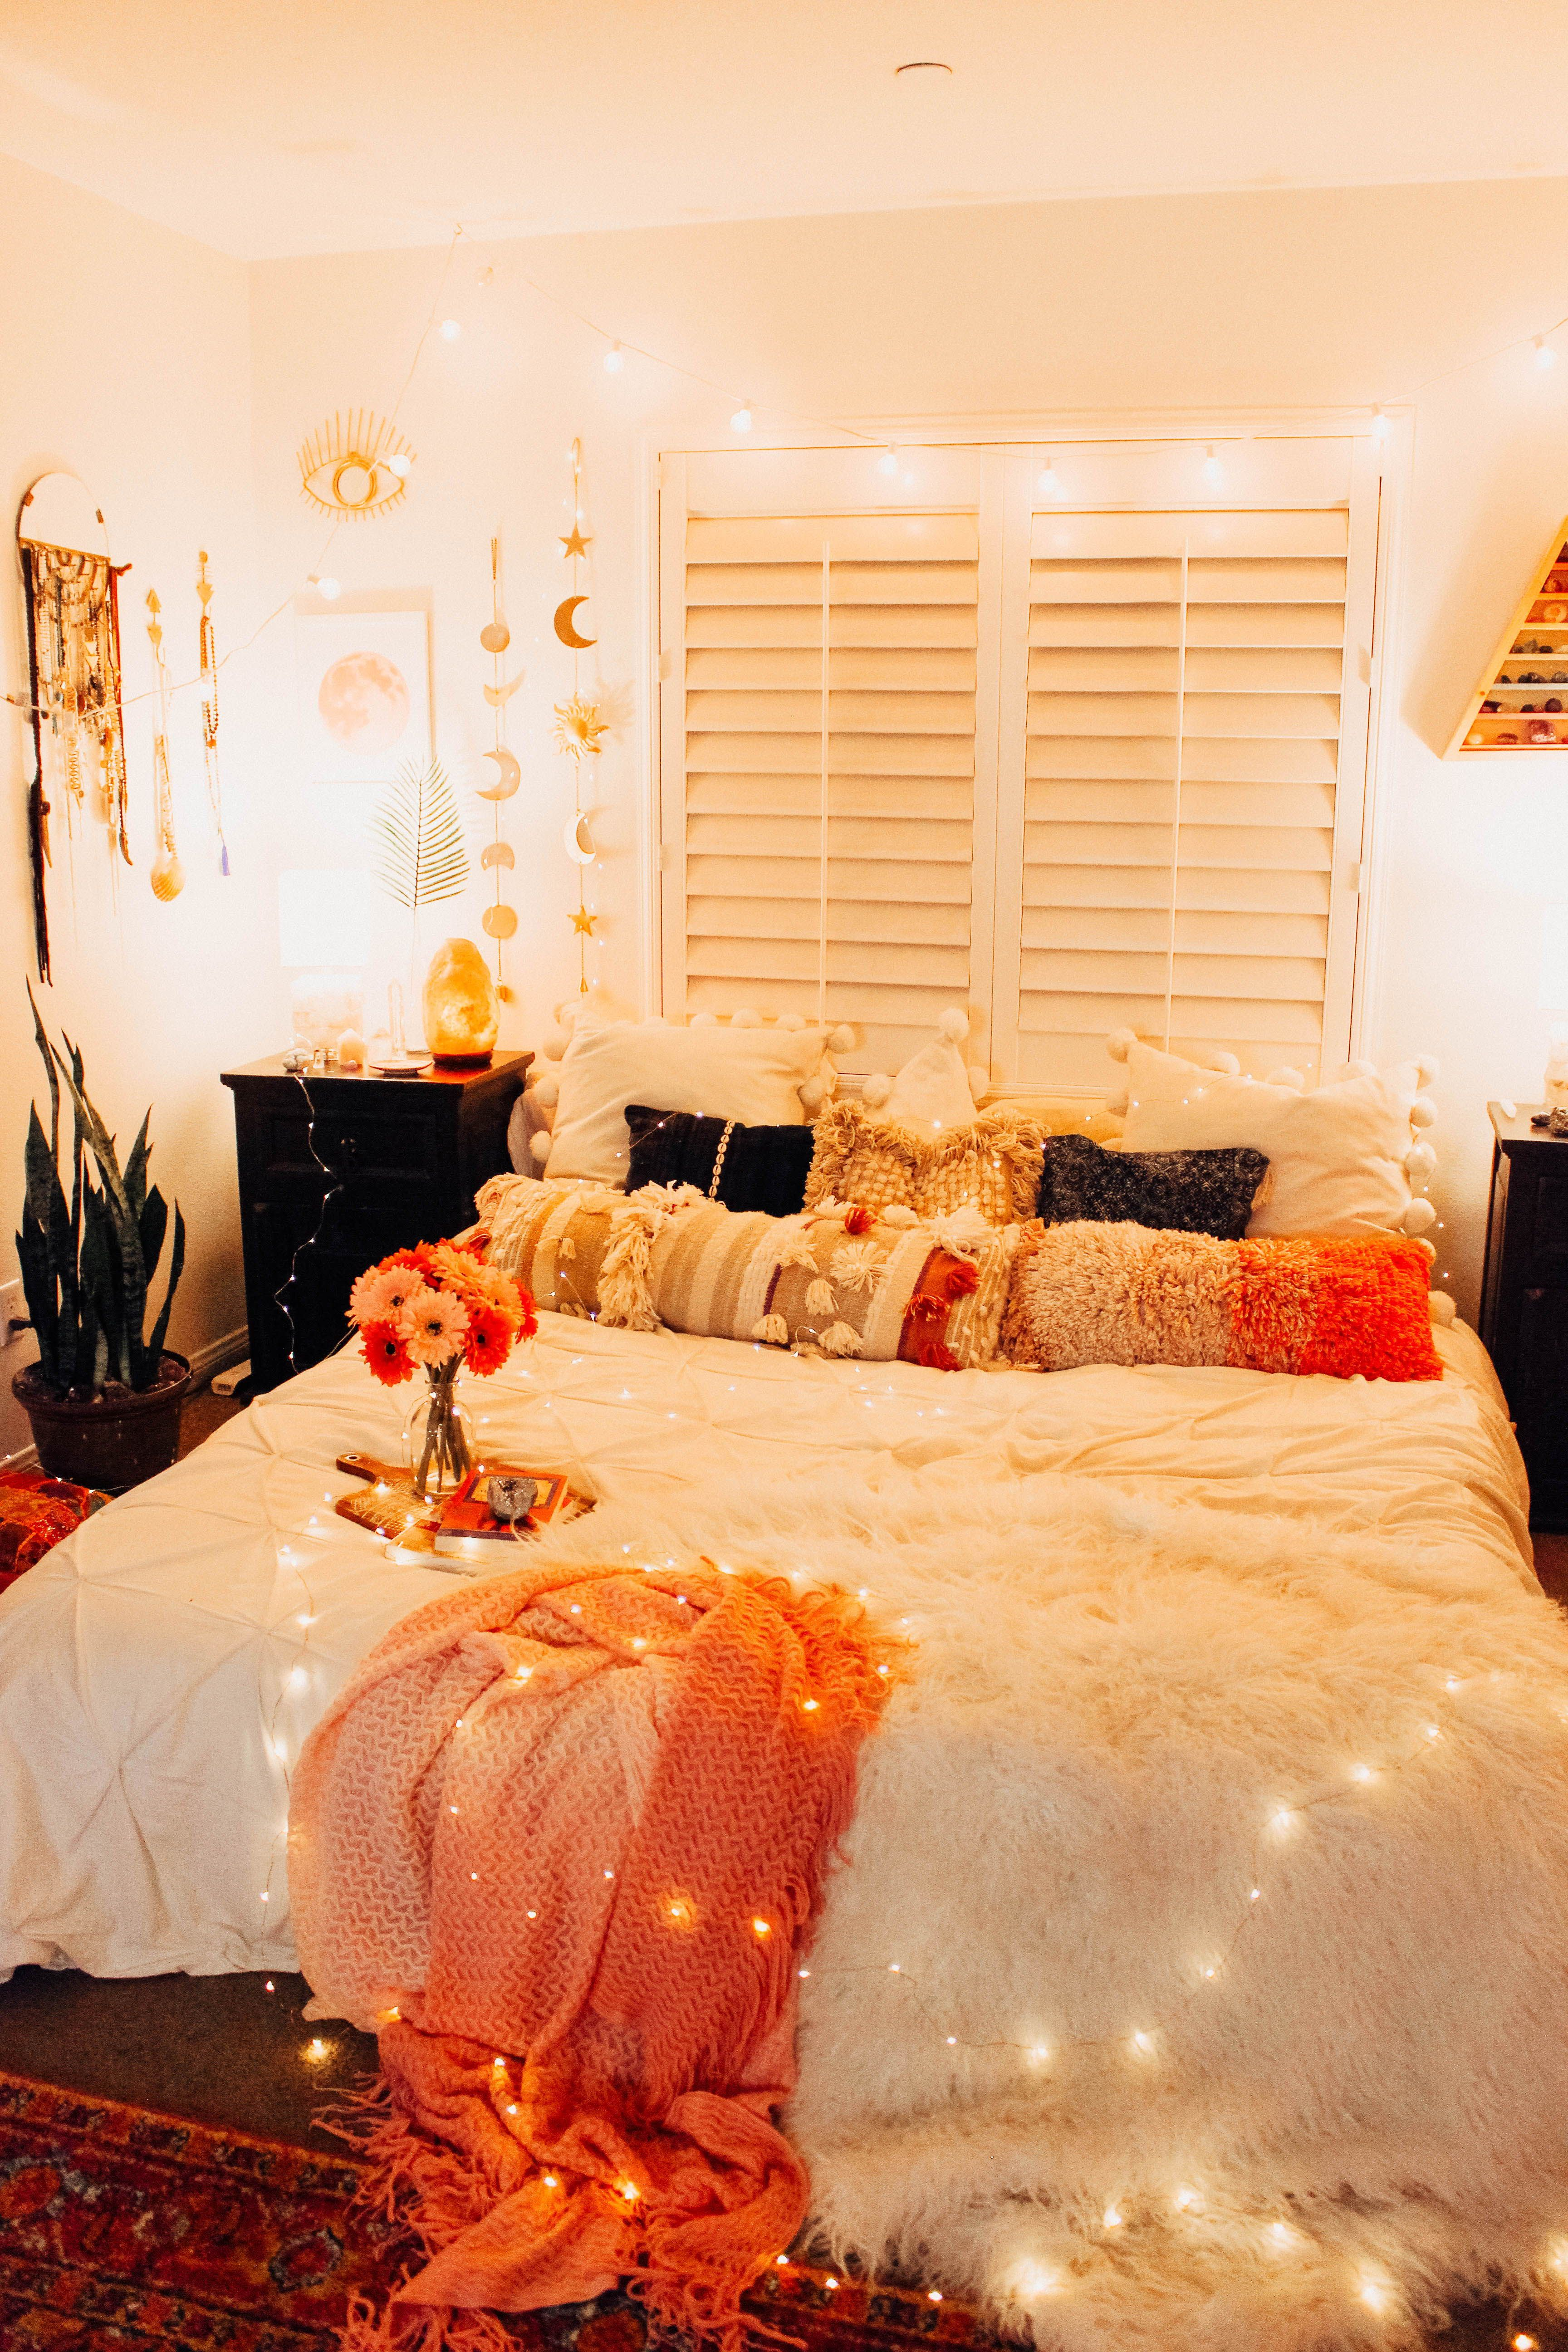 Celestial Wall Hanging Bedroom Decor Cozy Dorm Room Decor Bedroom Inspirations